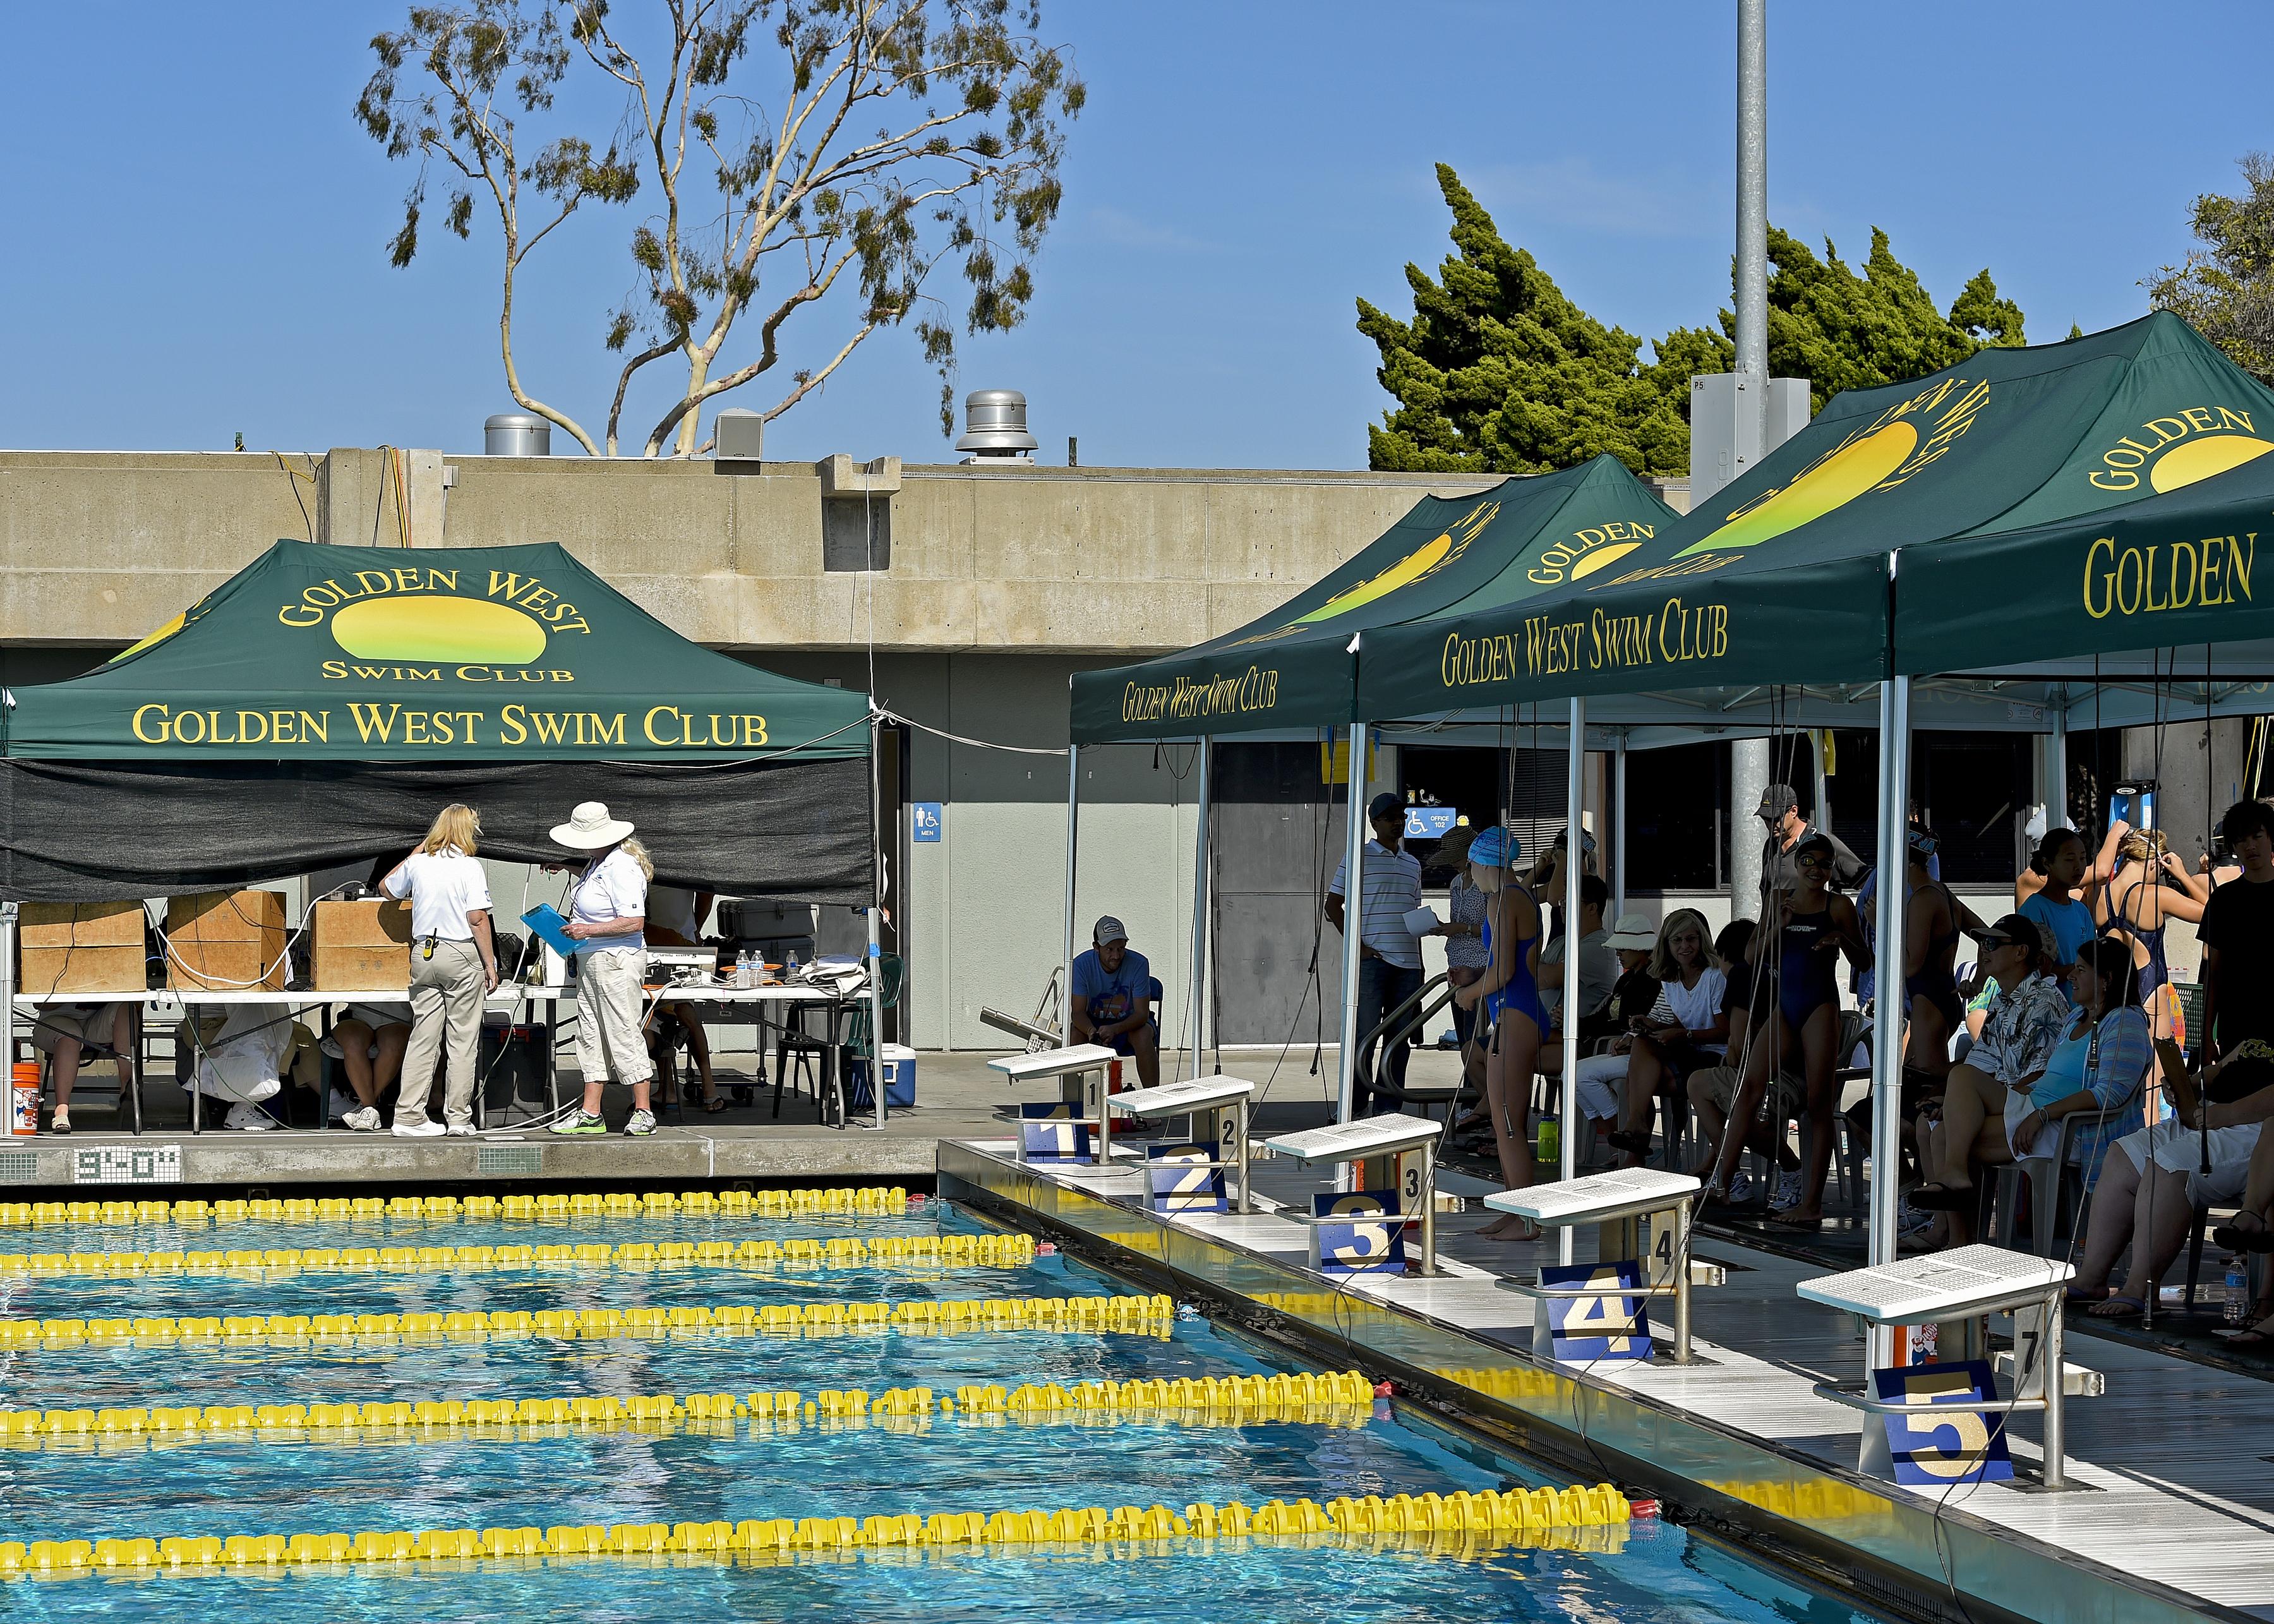 golden west swim club time standards